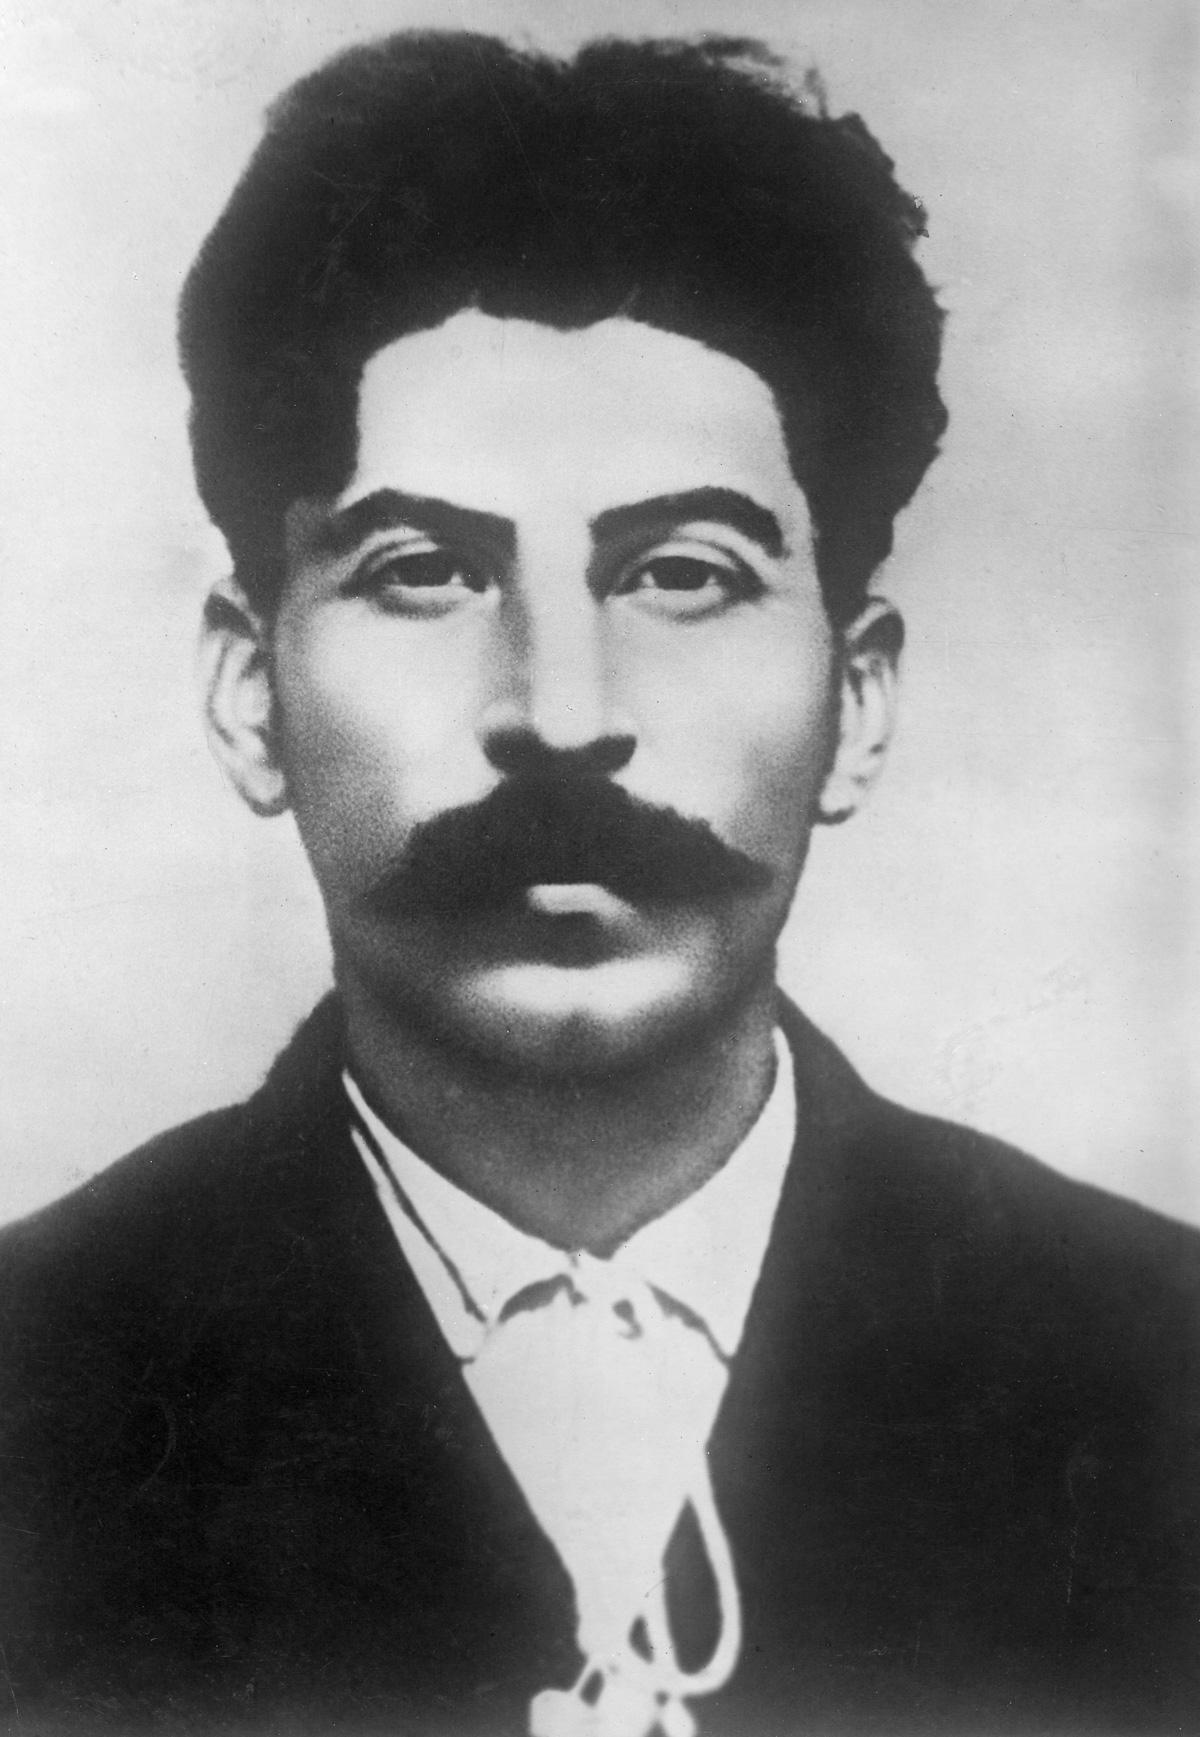 Stalin rannie foto 8